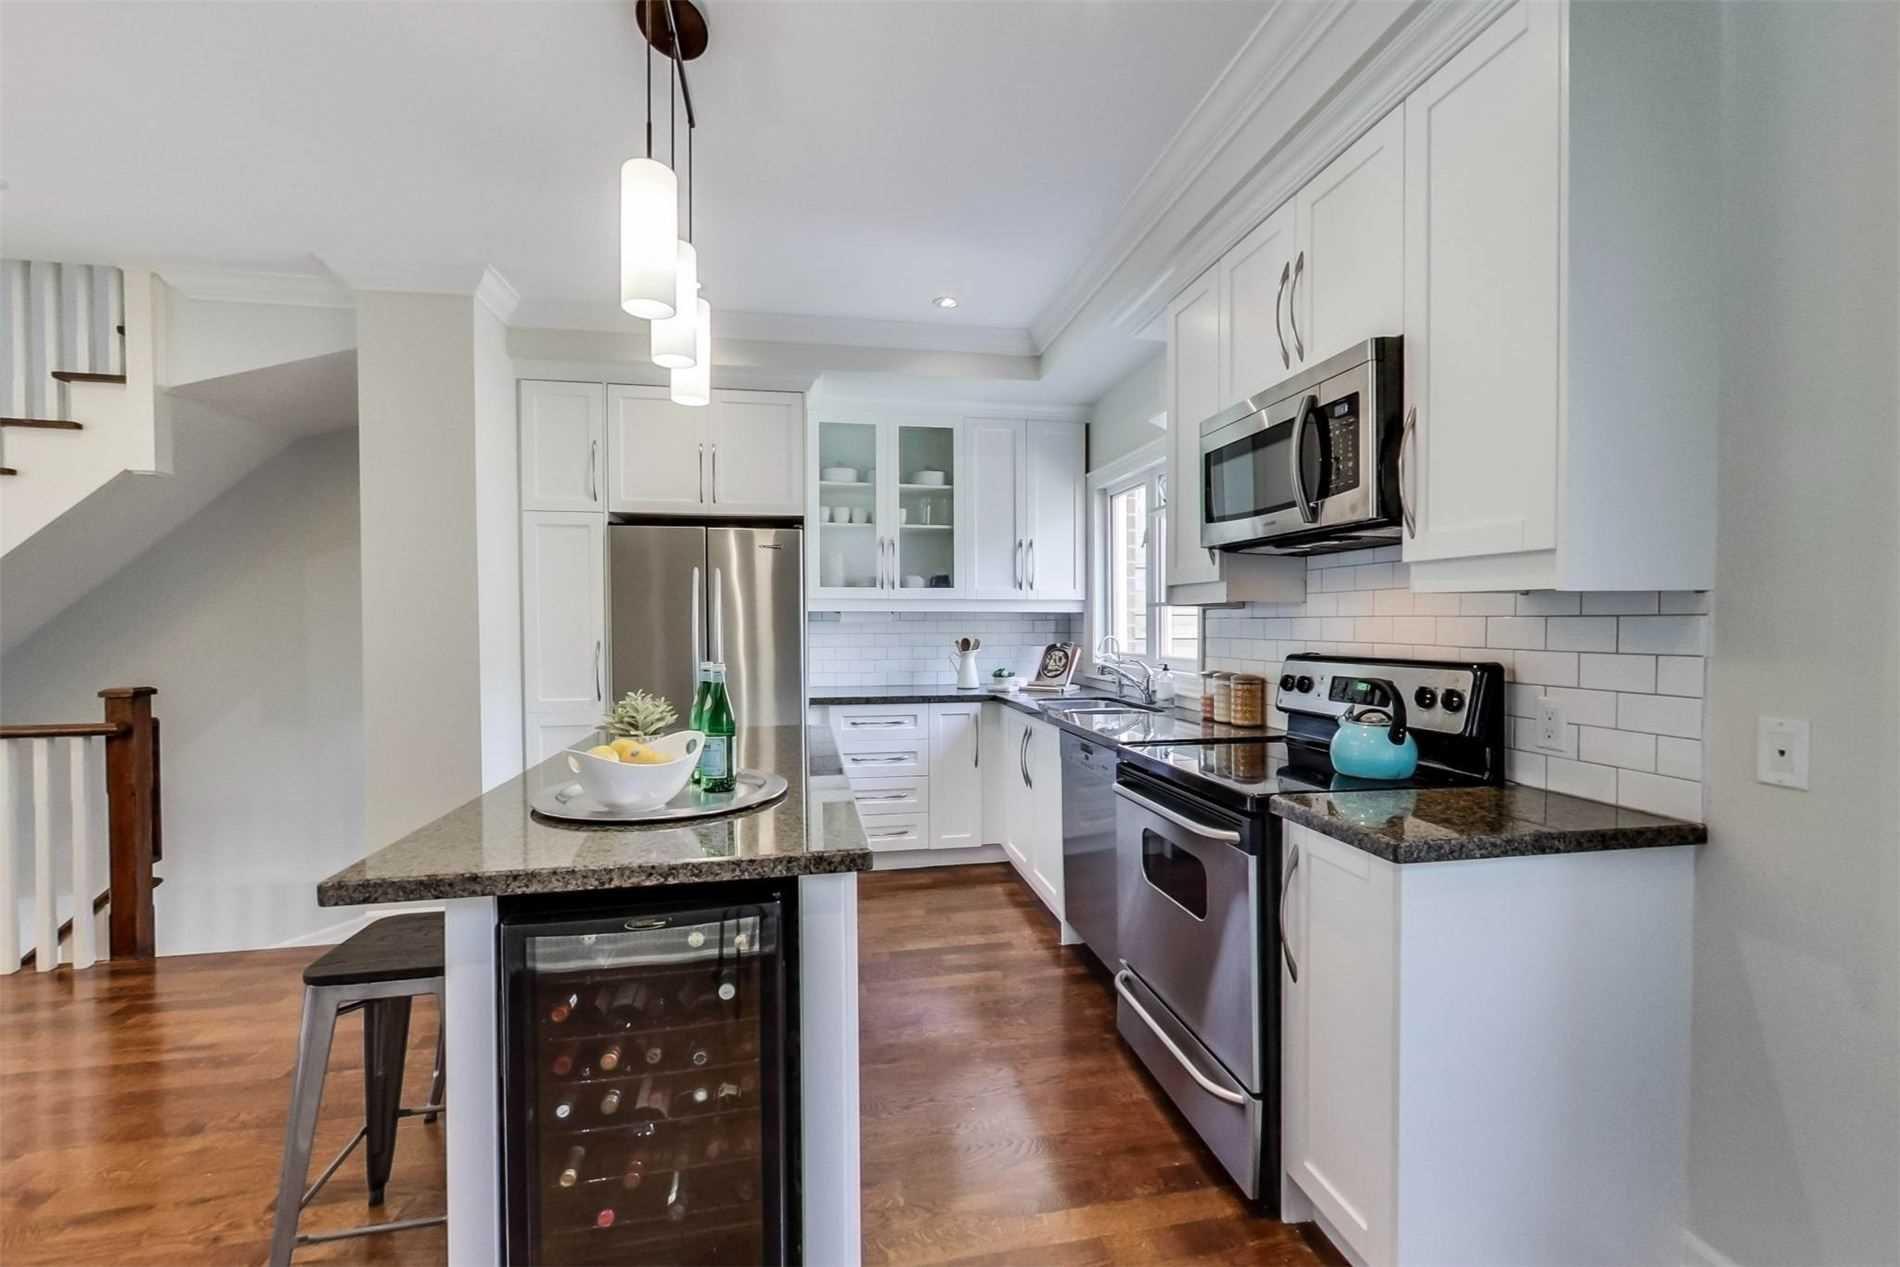 Photo 12: Photos: 213 Heward Avenue in Toronto: South Riverdale House (3-Storey) for sale (Toronto E01)  : MLS®# E4941877